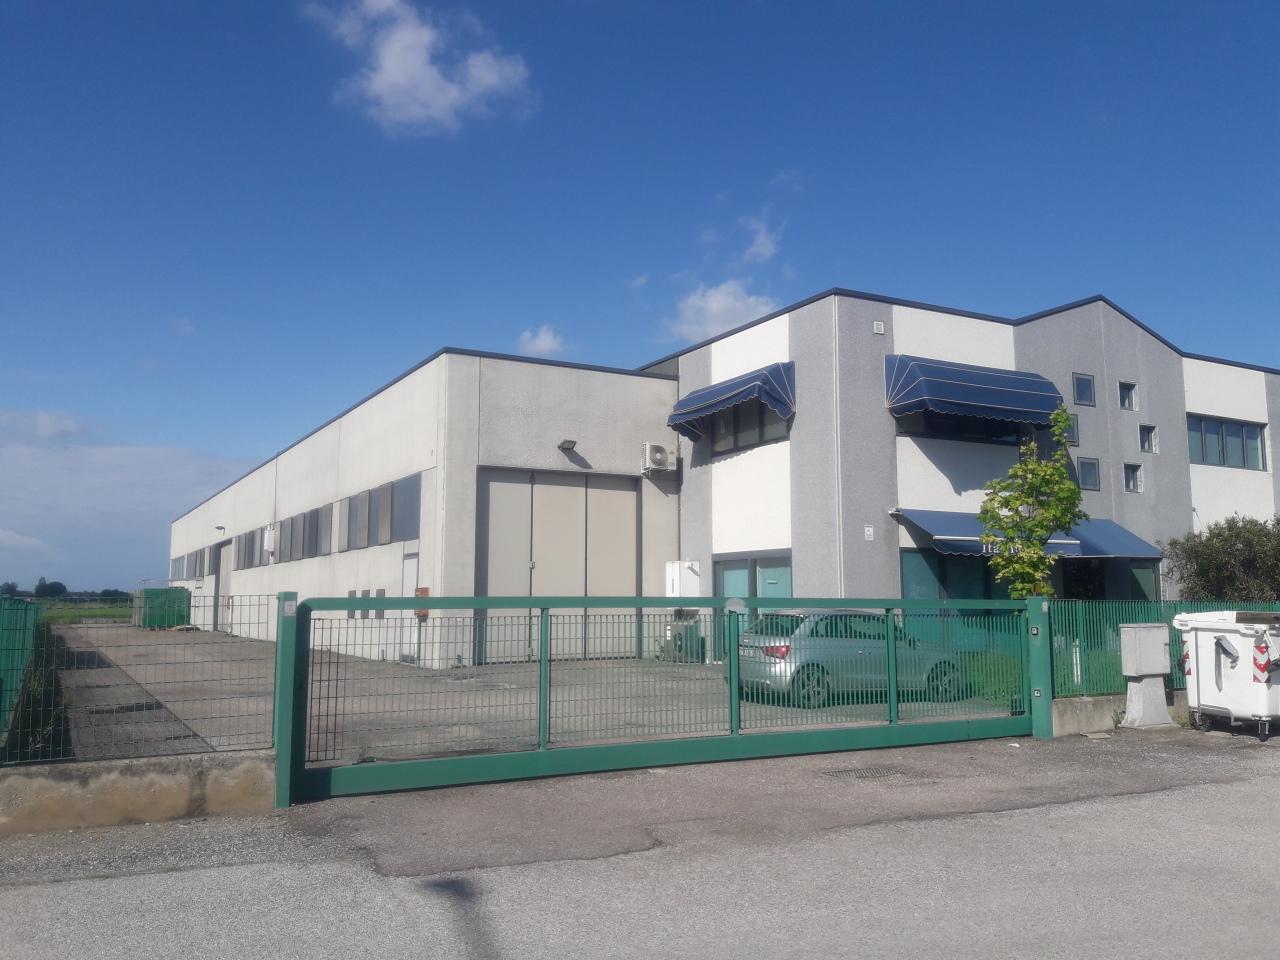 Capannone / Fondo - Industriale/Artigianale a Rovigo Rif. 12364428